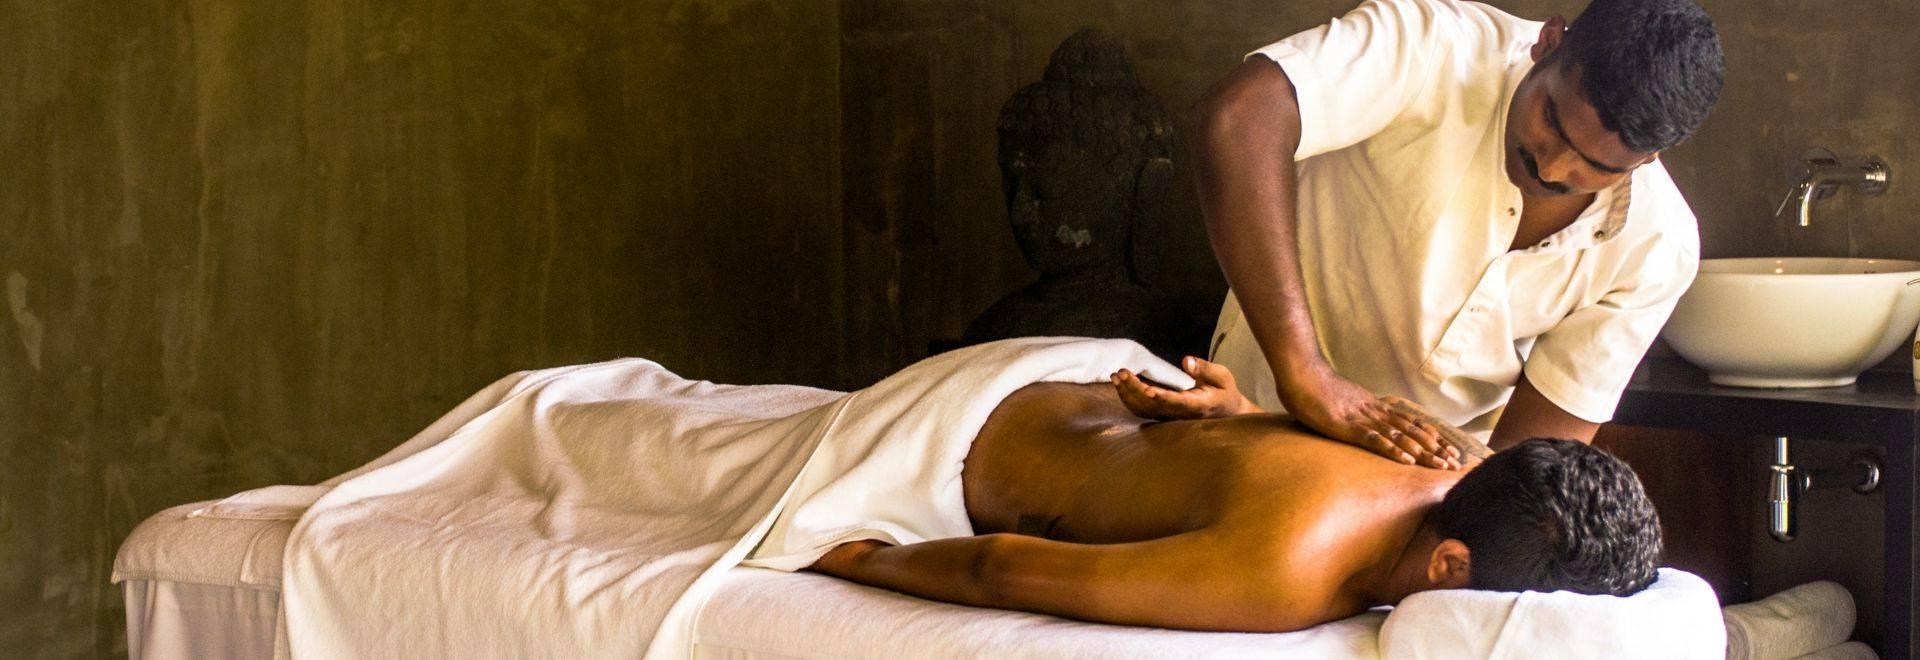 Santani-massage.jpg